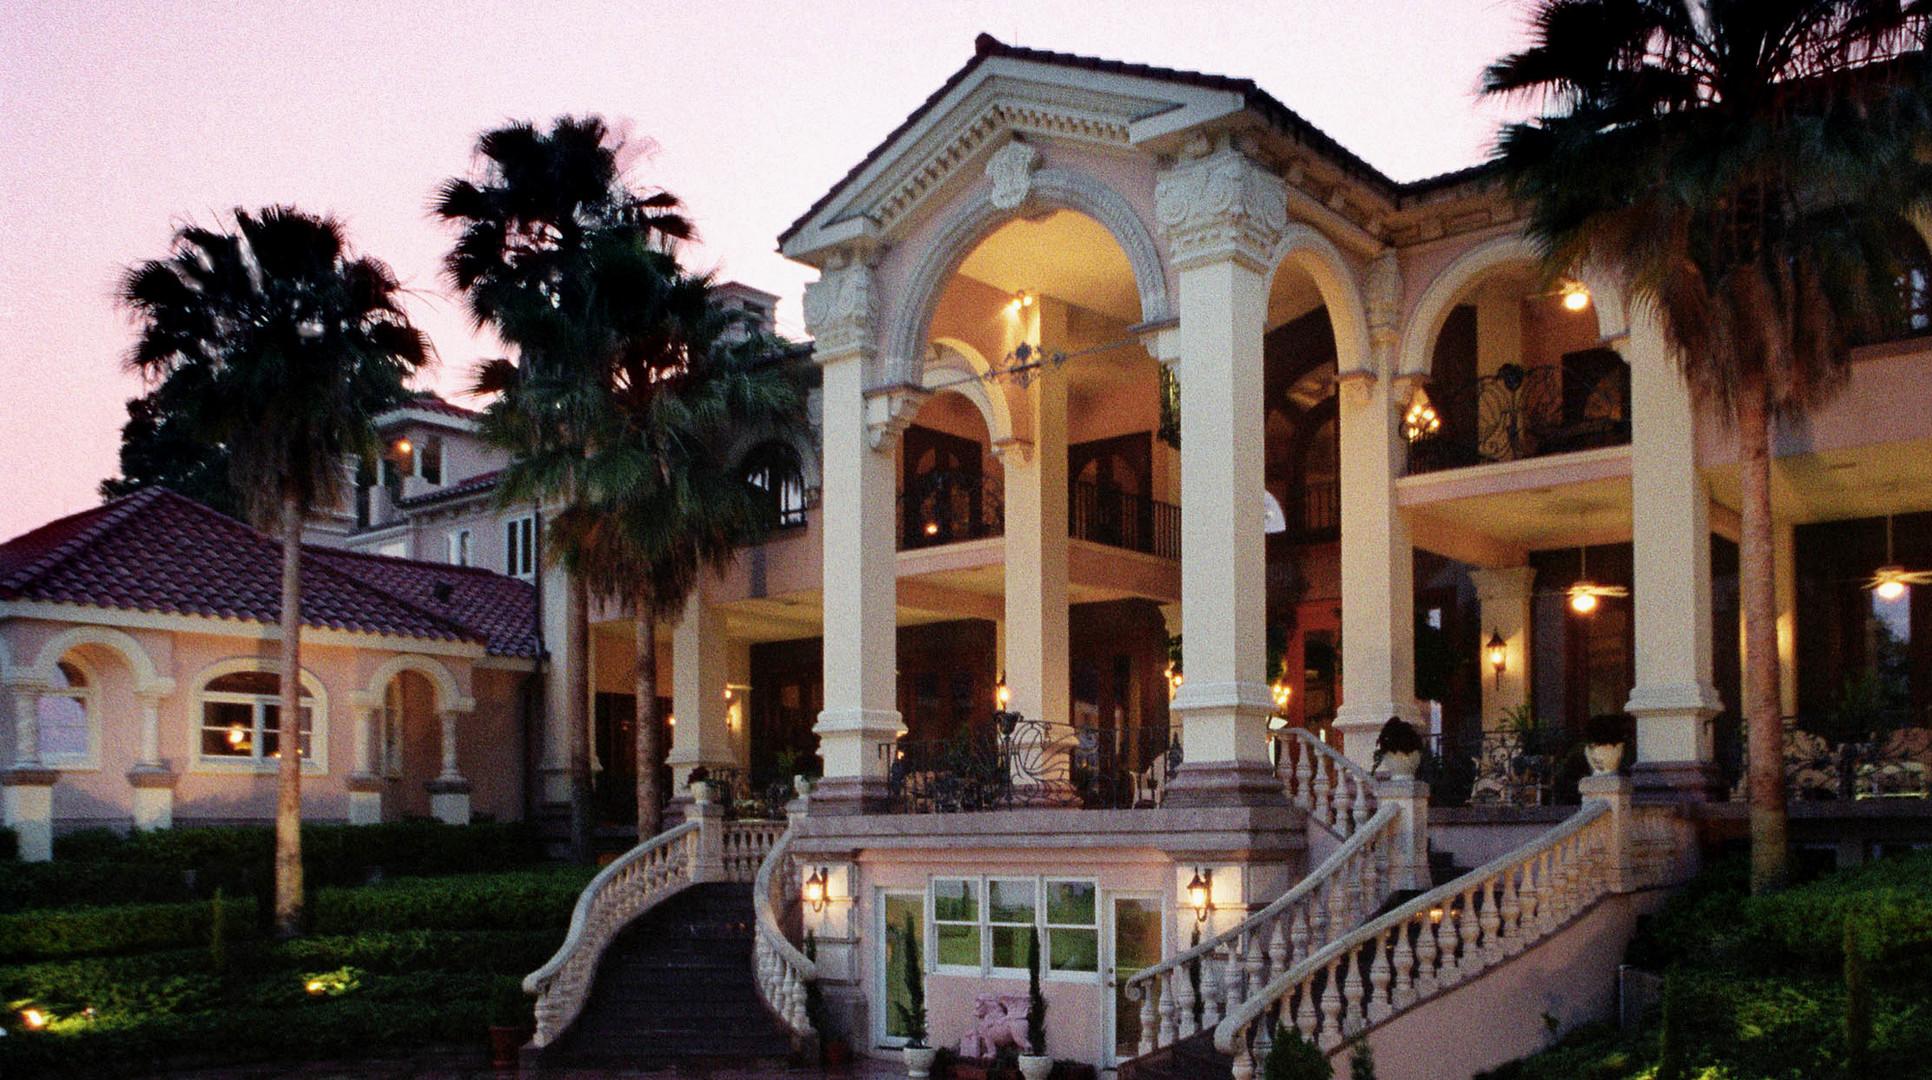 Florida luxury home plans architect.jpg